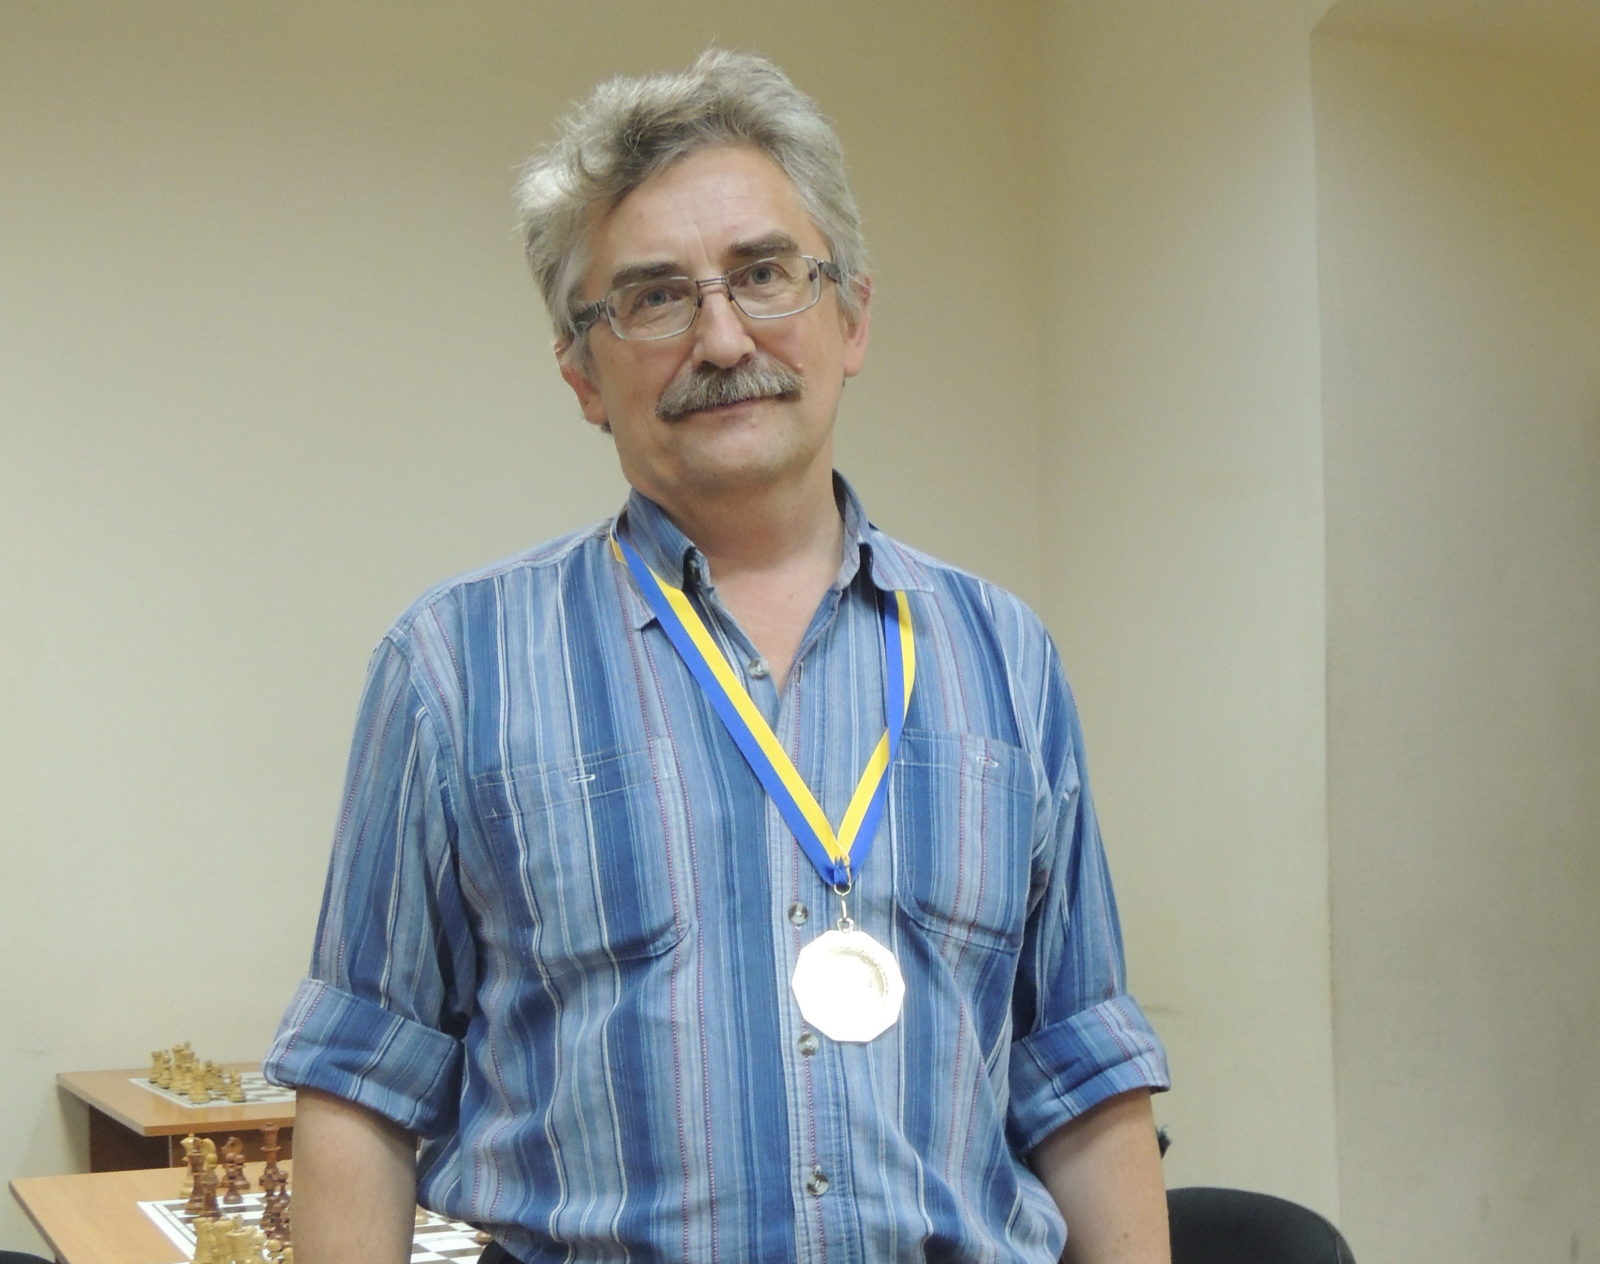 В.Жалдыбин - чемпион Днепра 2018